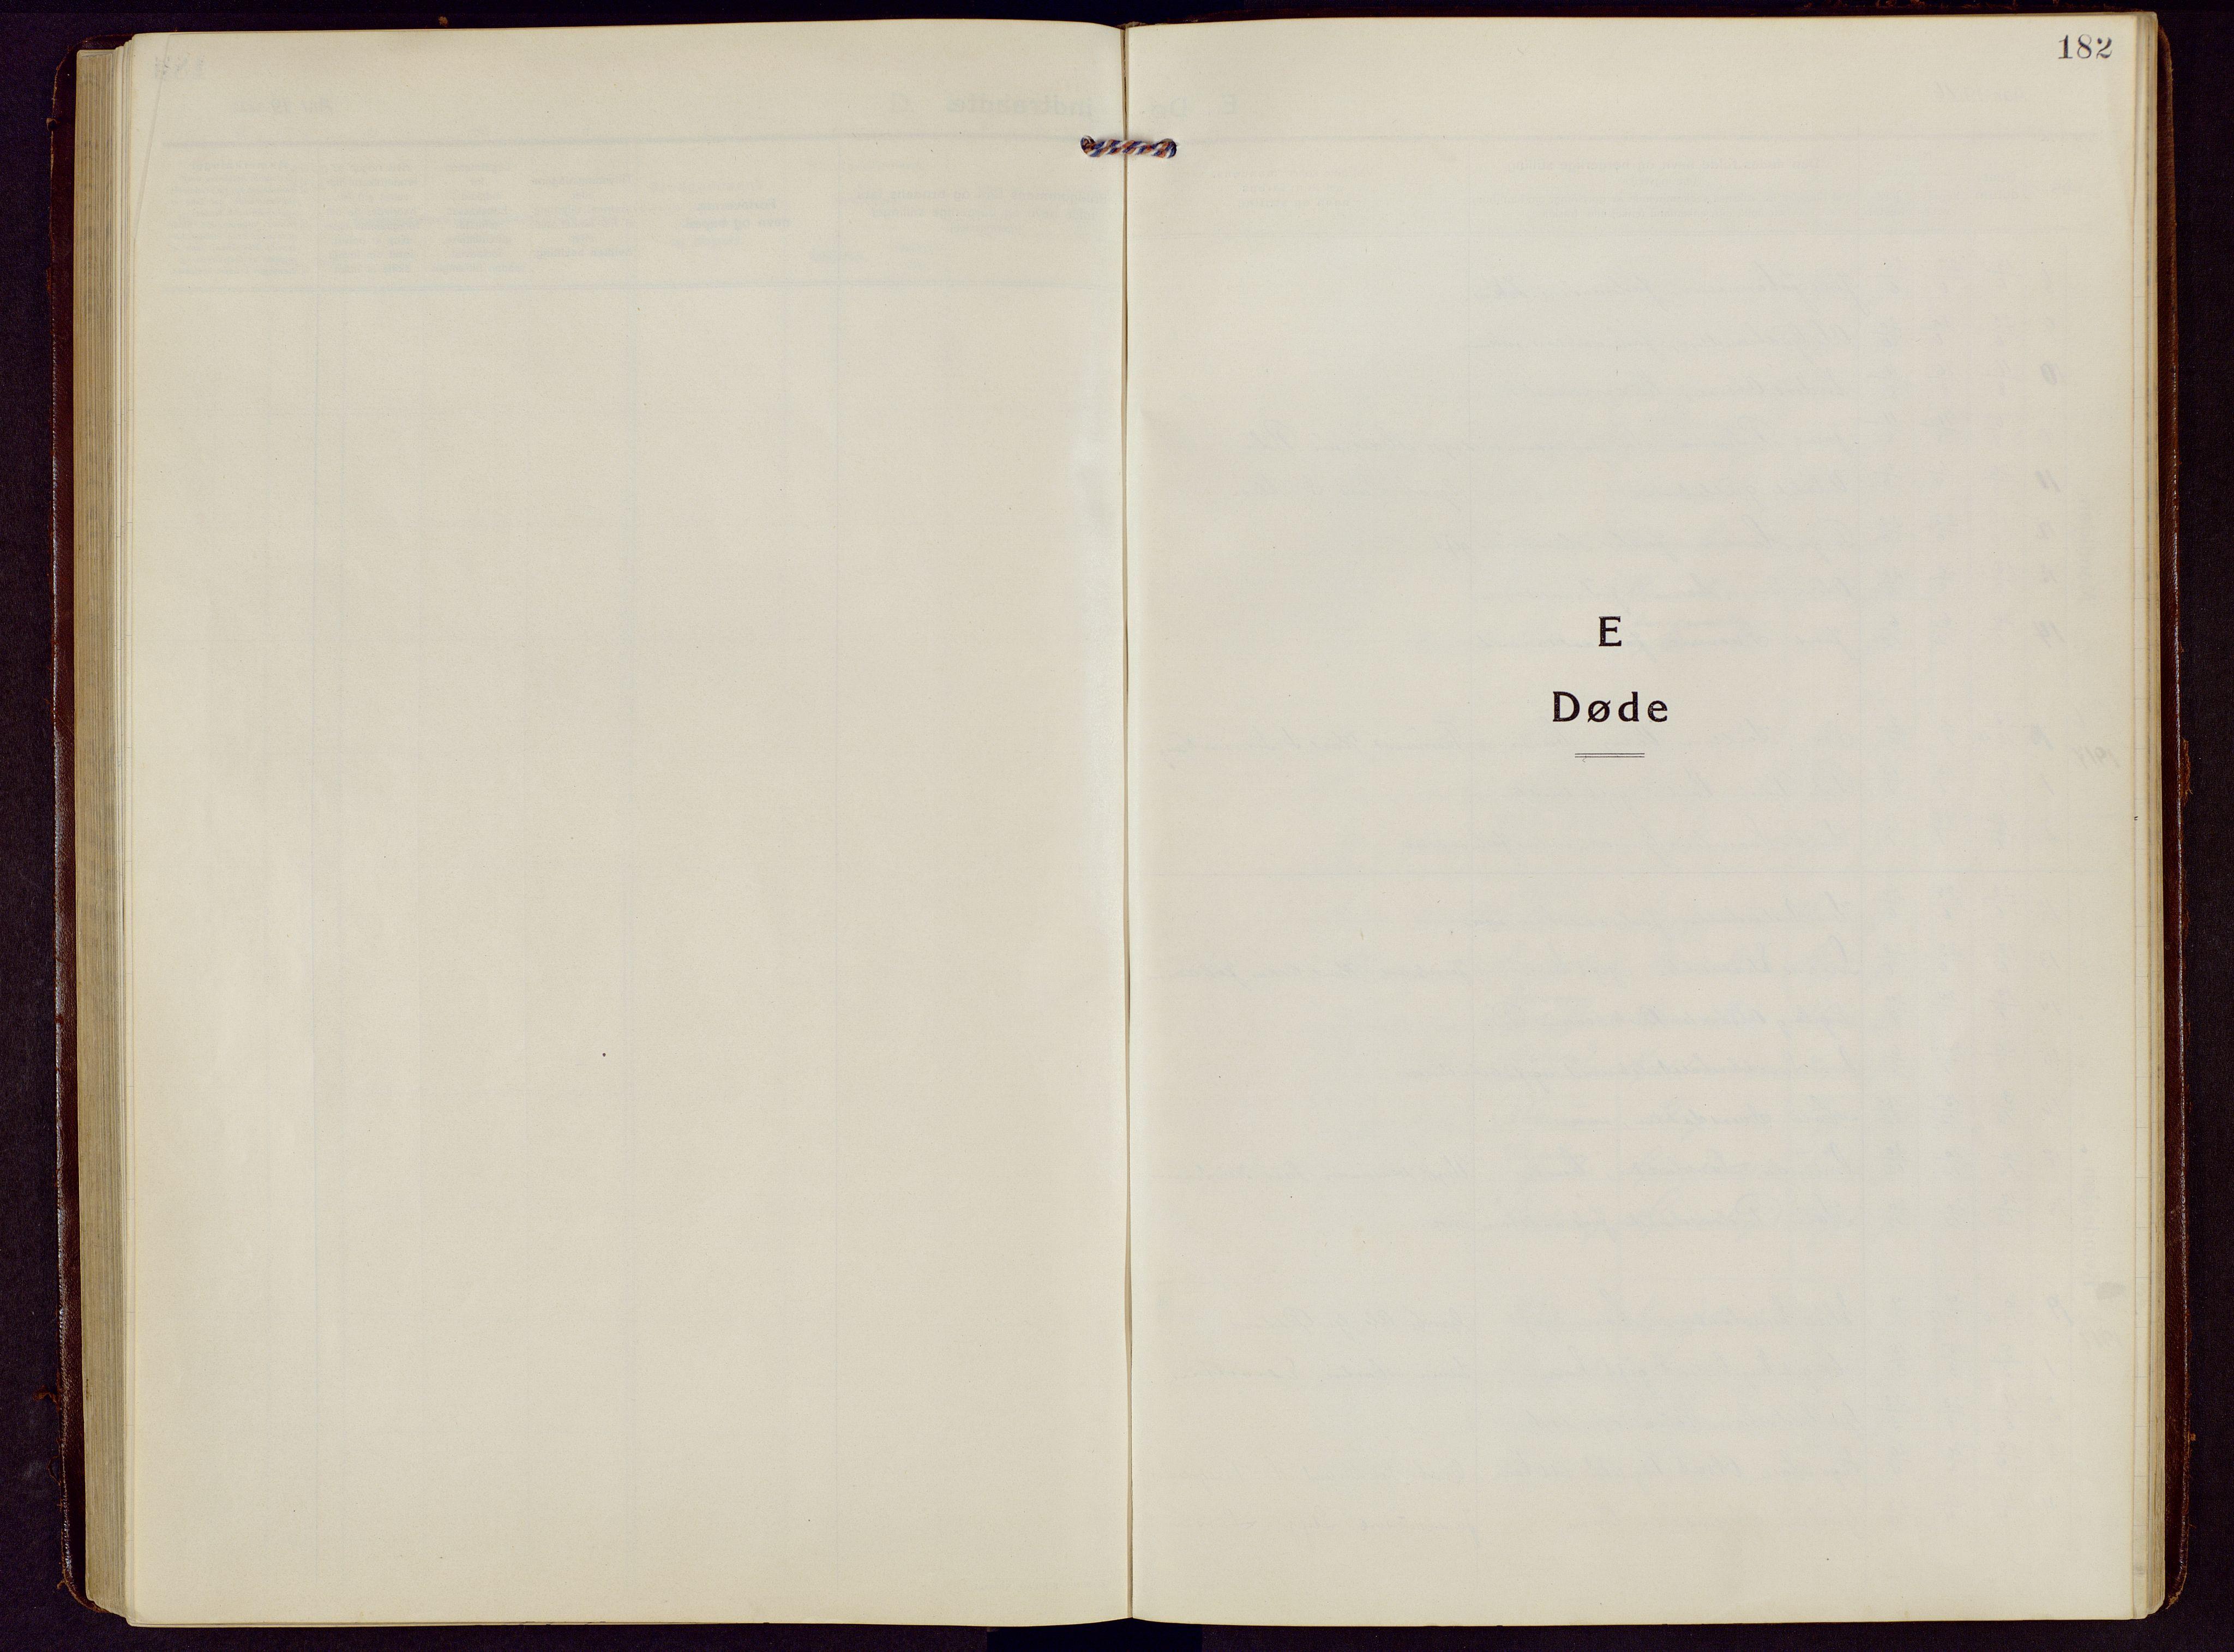 SAH, Brandbu prestekontor, Klokkerbok nr. 10, 1916-1930, s. 182